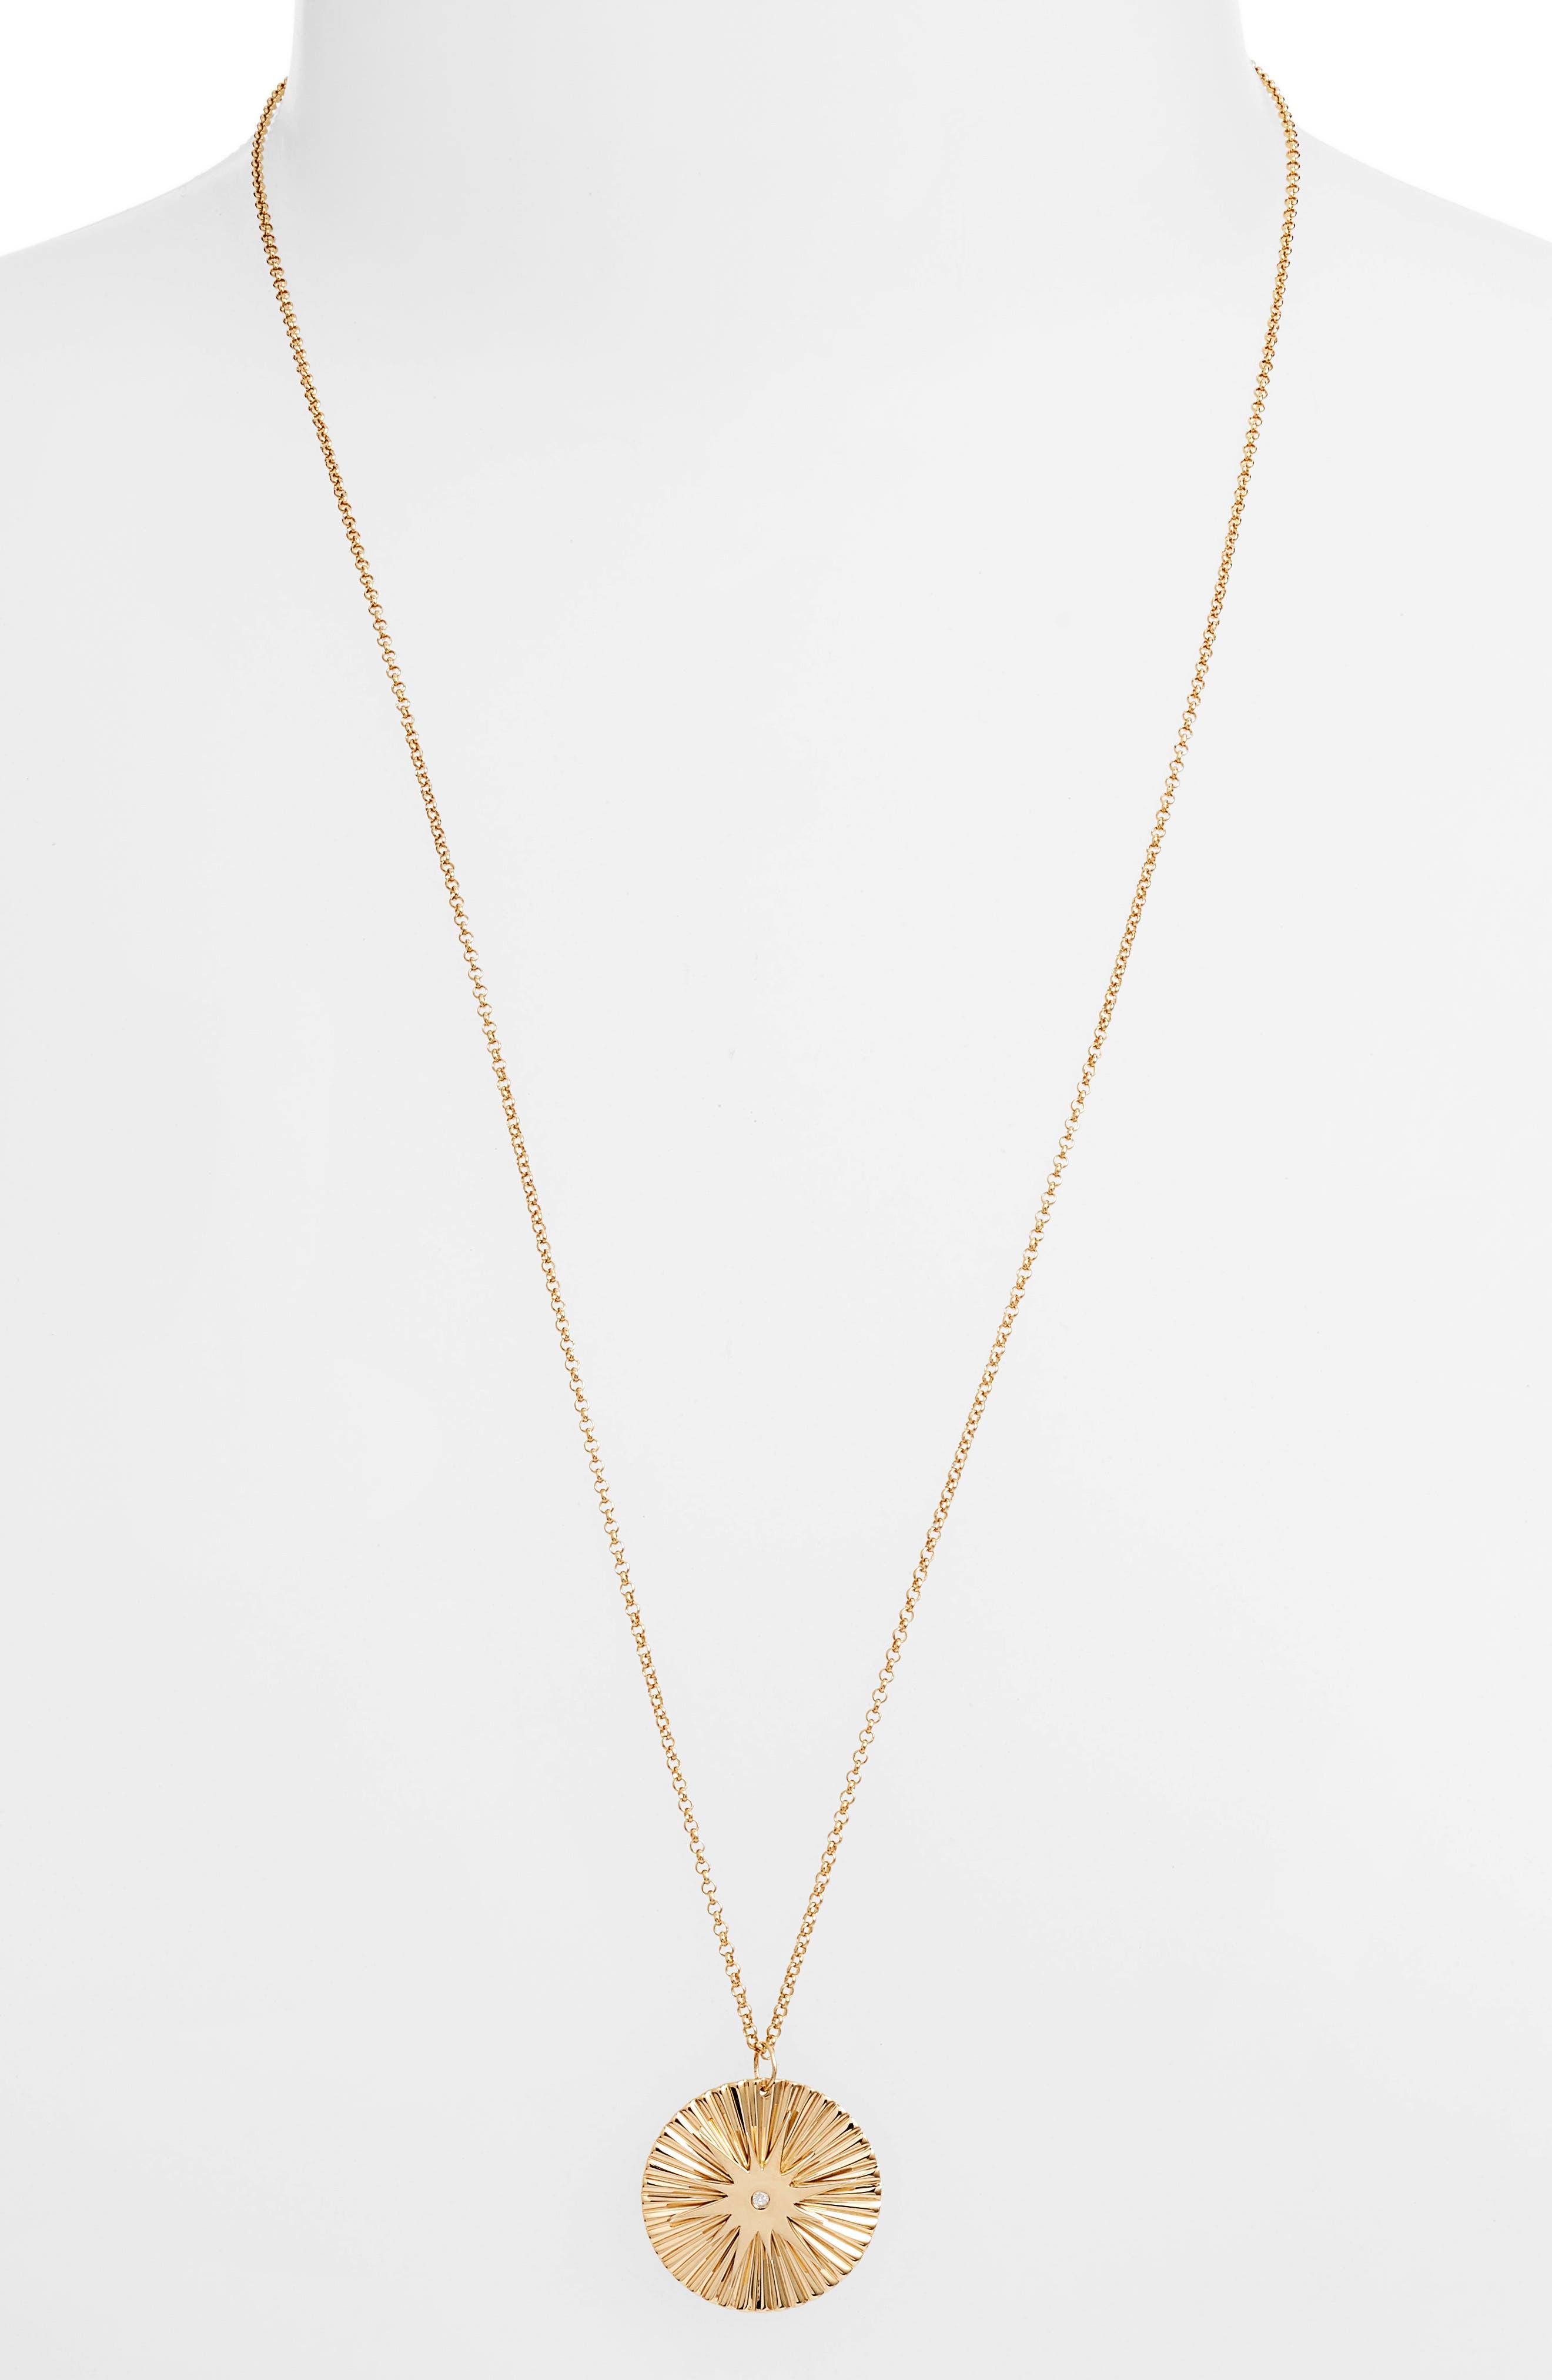 Iris Arlene Starburst Pendant Necklace,                             Main thumbnail 1, color,                             Yellow Vermeil